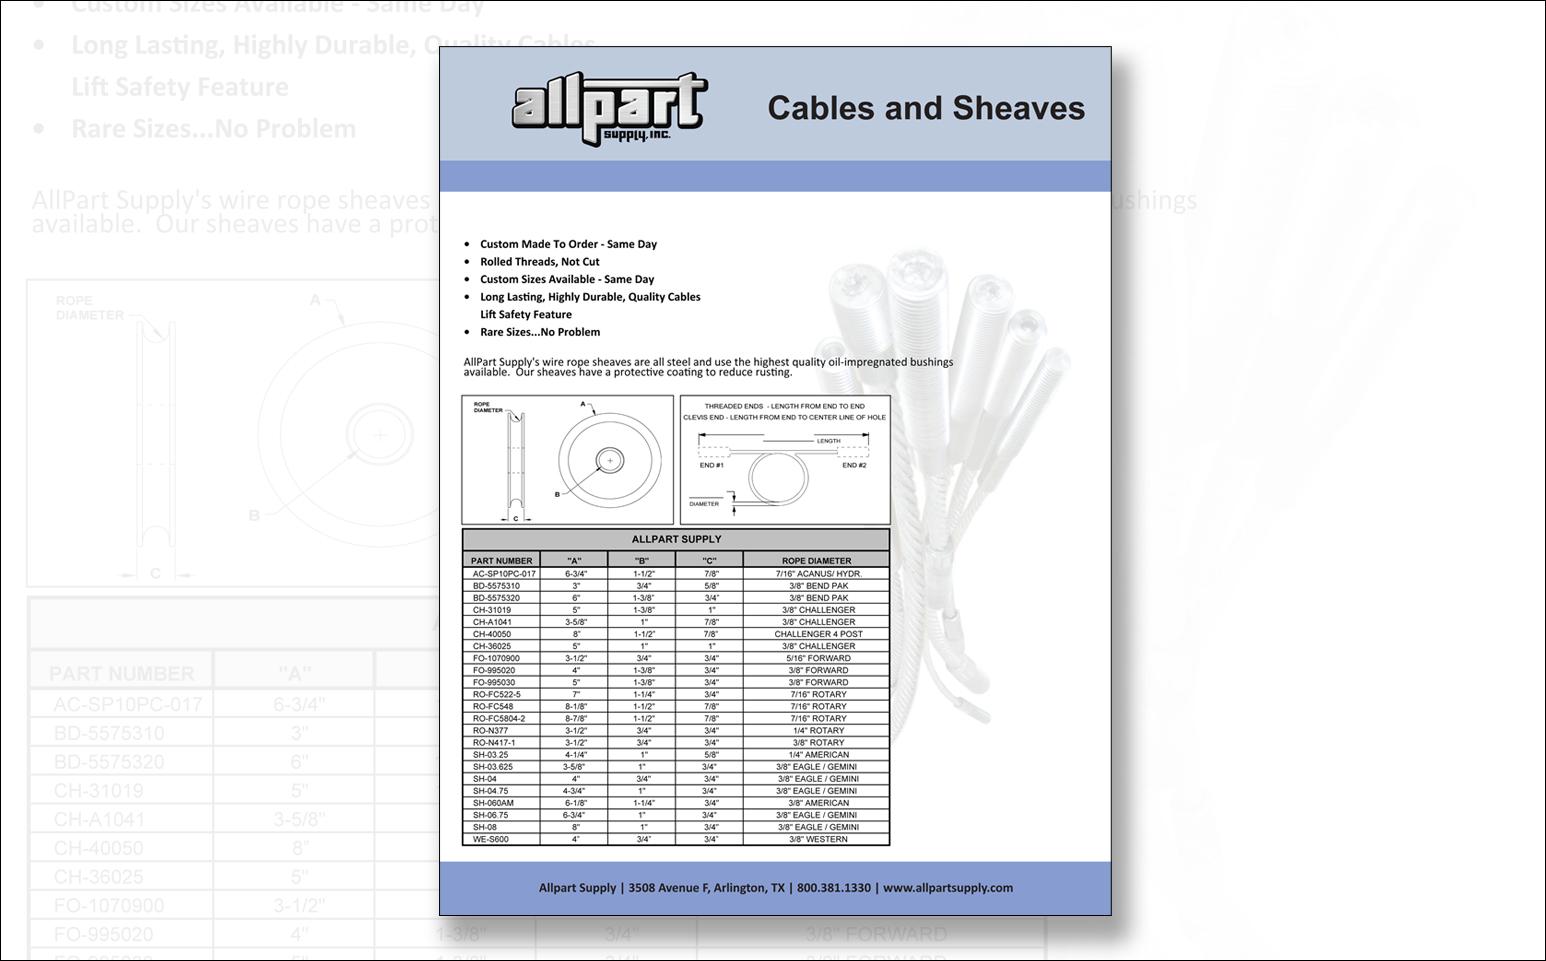 Bendpak Lift Wiring 19 Diagram Images Diagrams Auto Allpartflyers Cables Sheavesfit15462c961 Parts